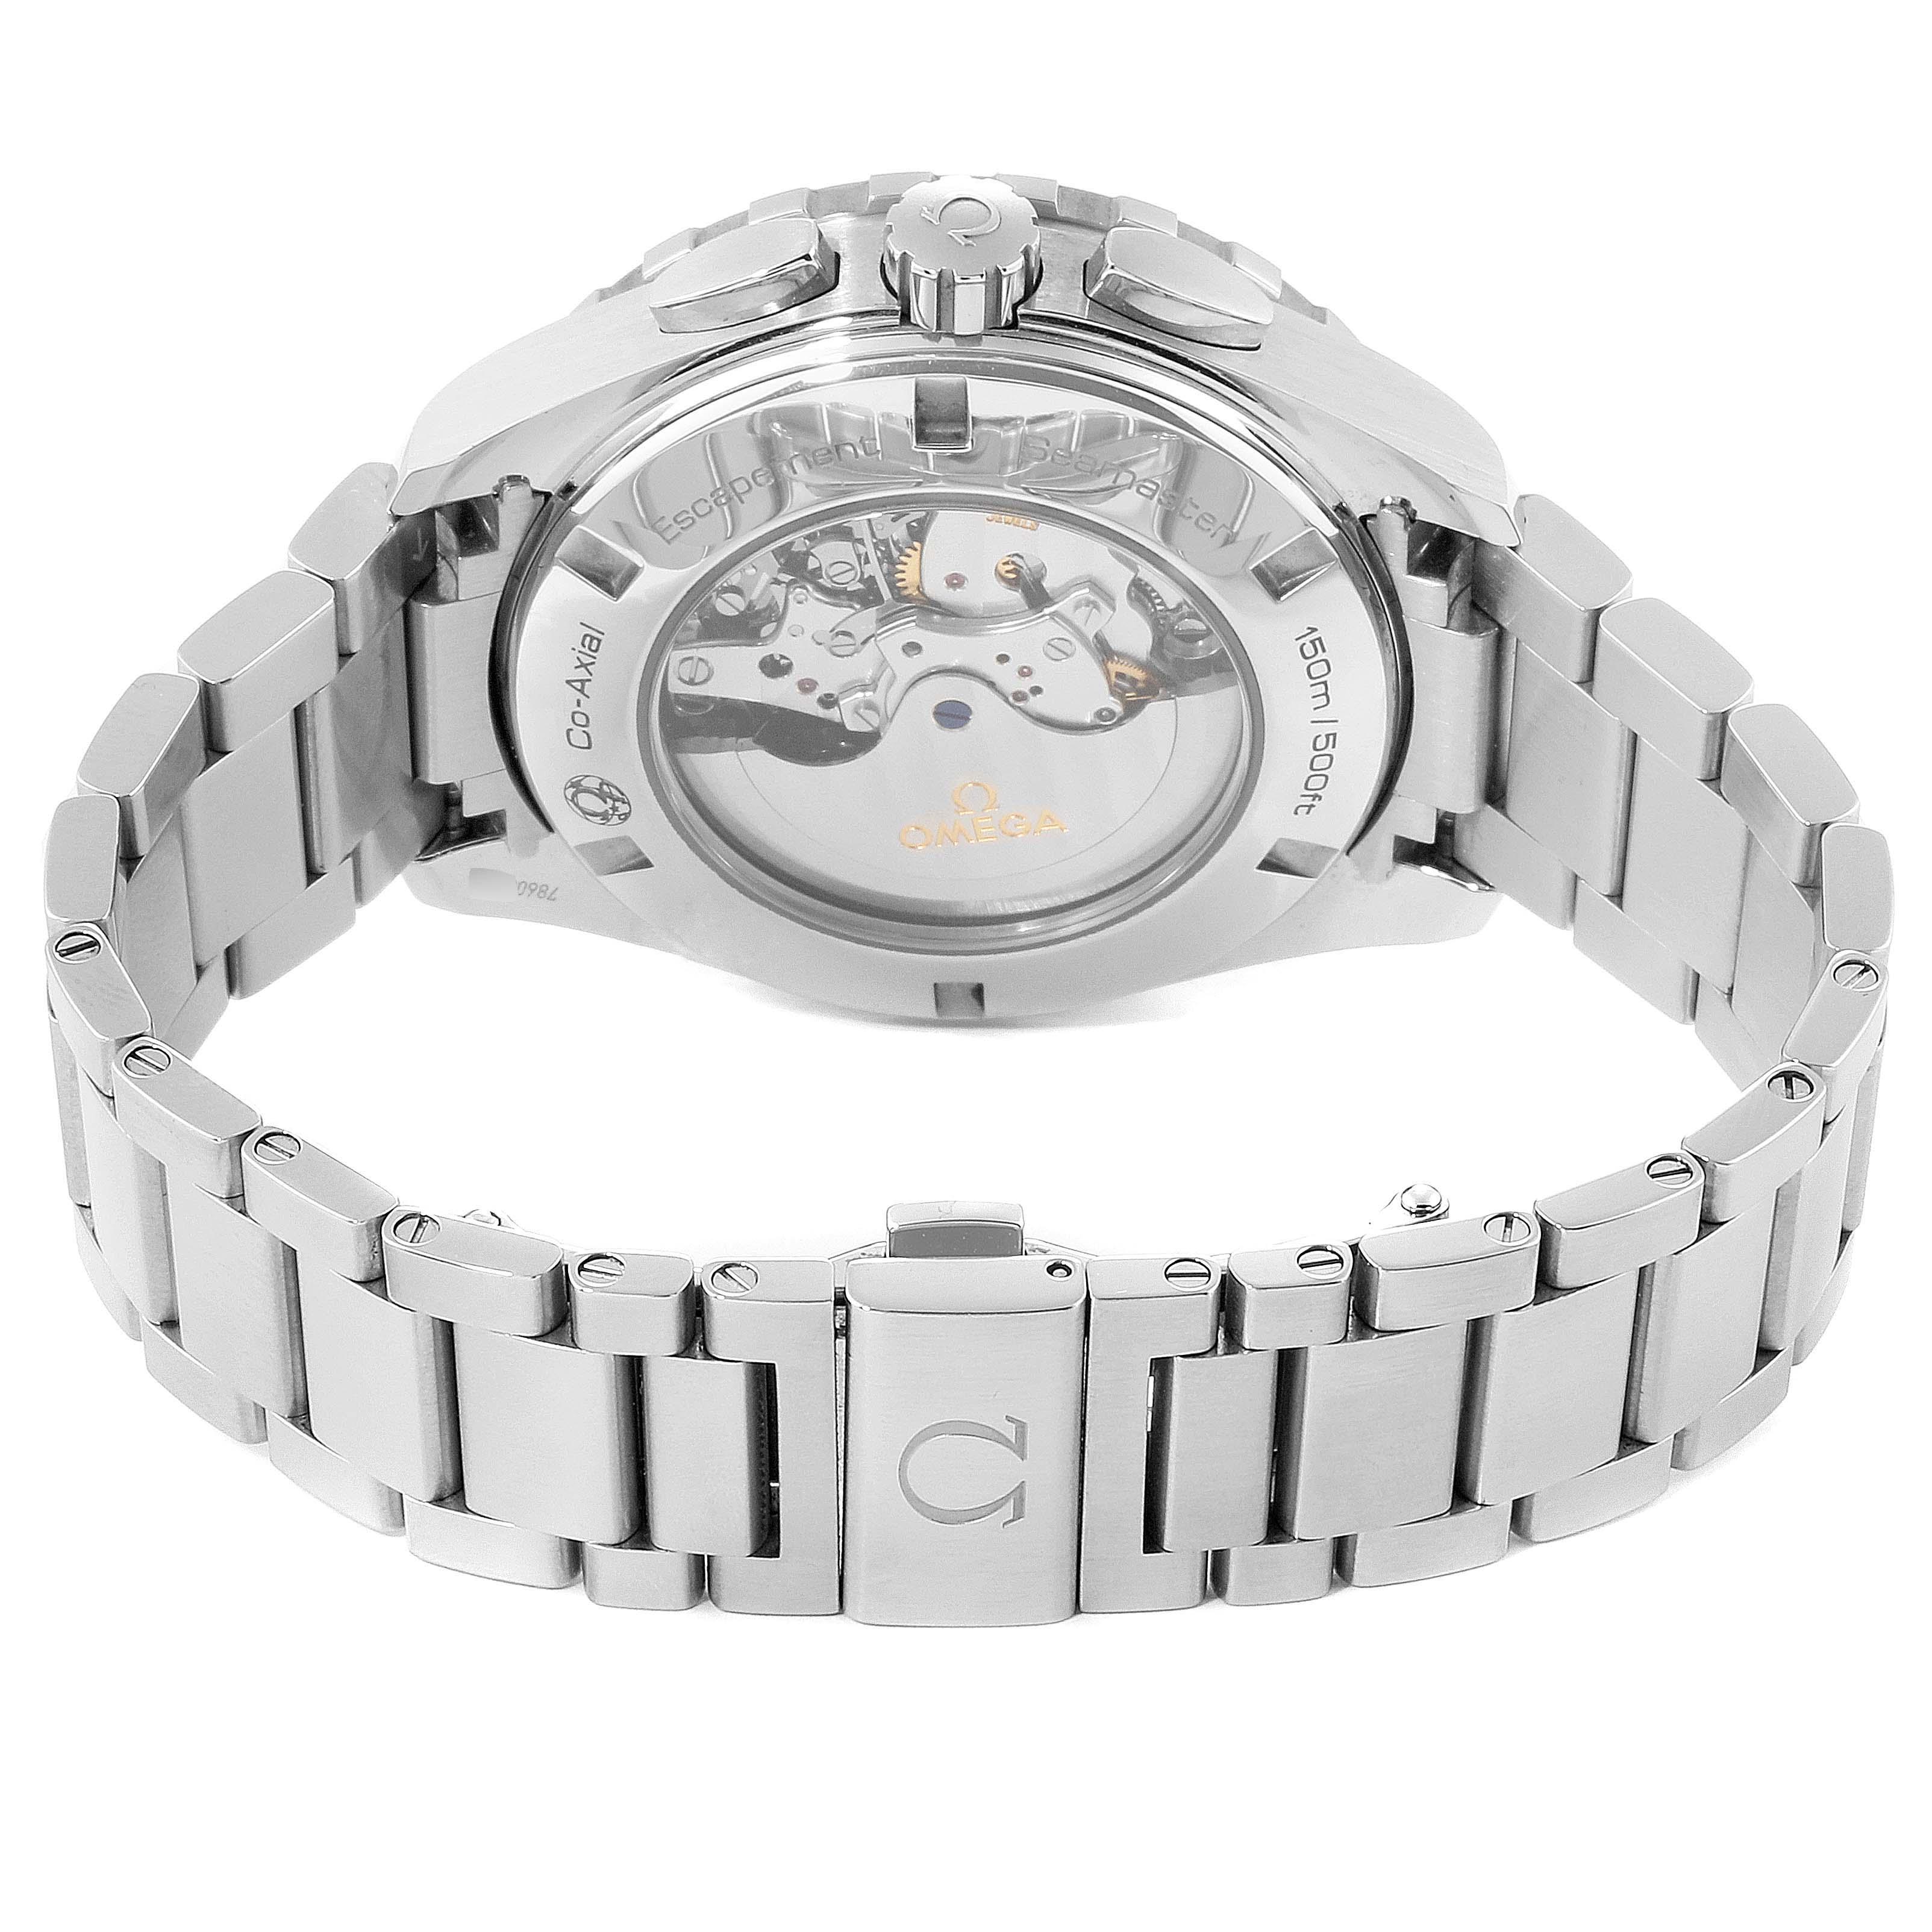 Omega Seamaster Aqua Terra GMT Watch 231.10.44.52.06.001 Box Papers SwissWatchExpo